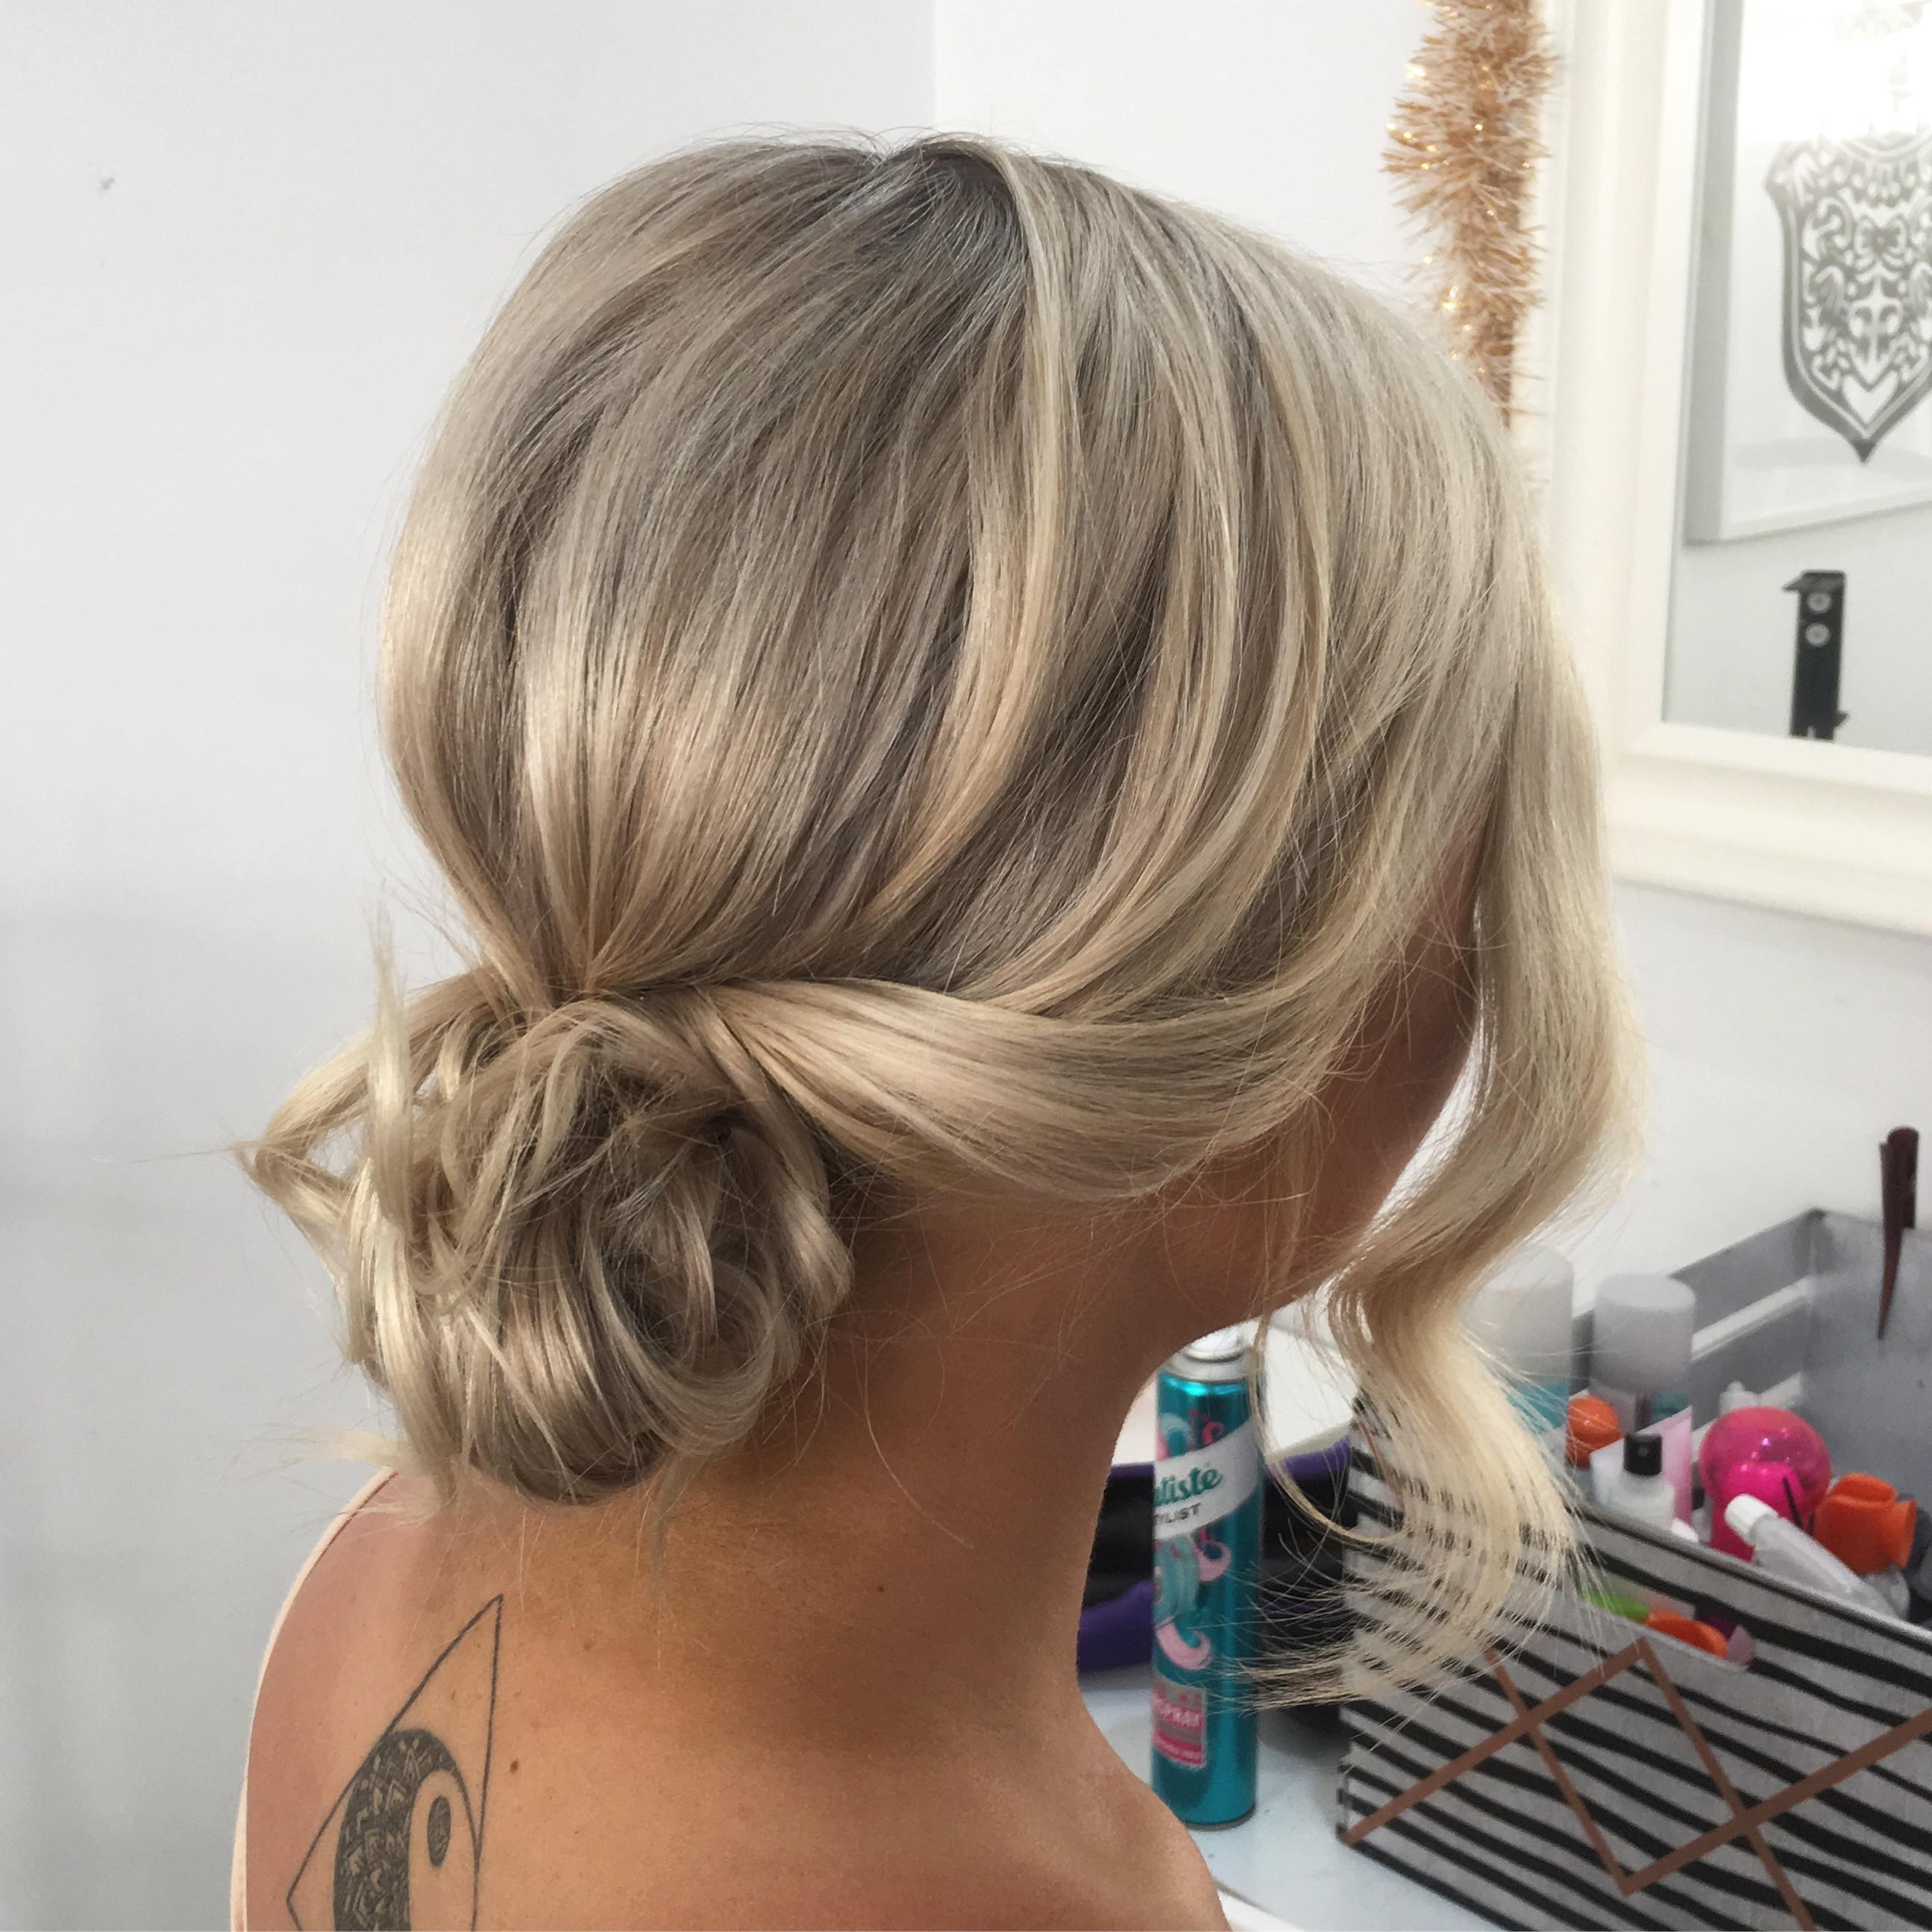 Short/Medium Hair Up-Styling